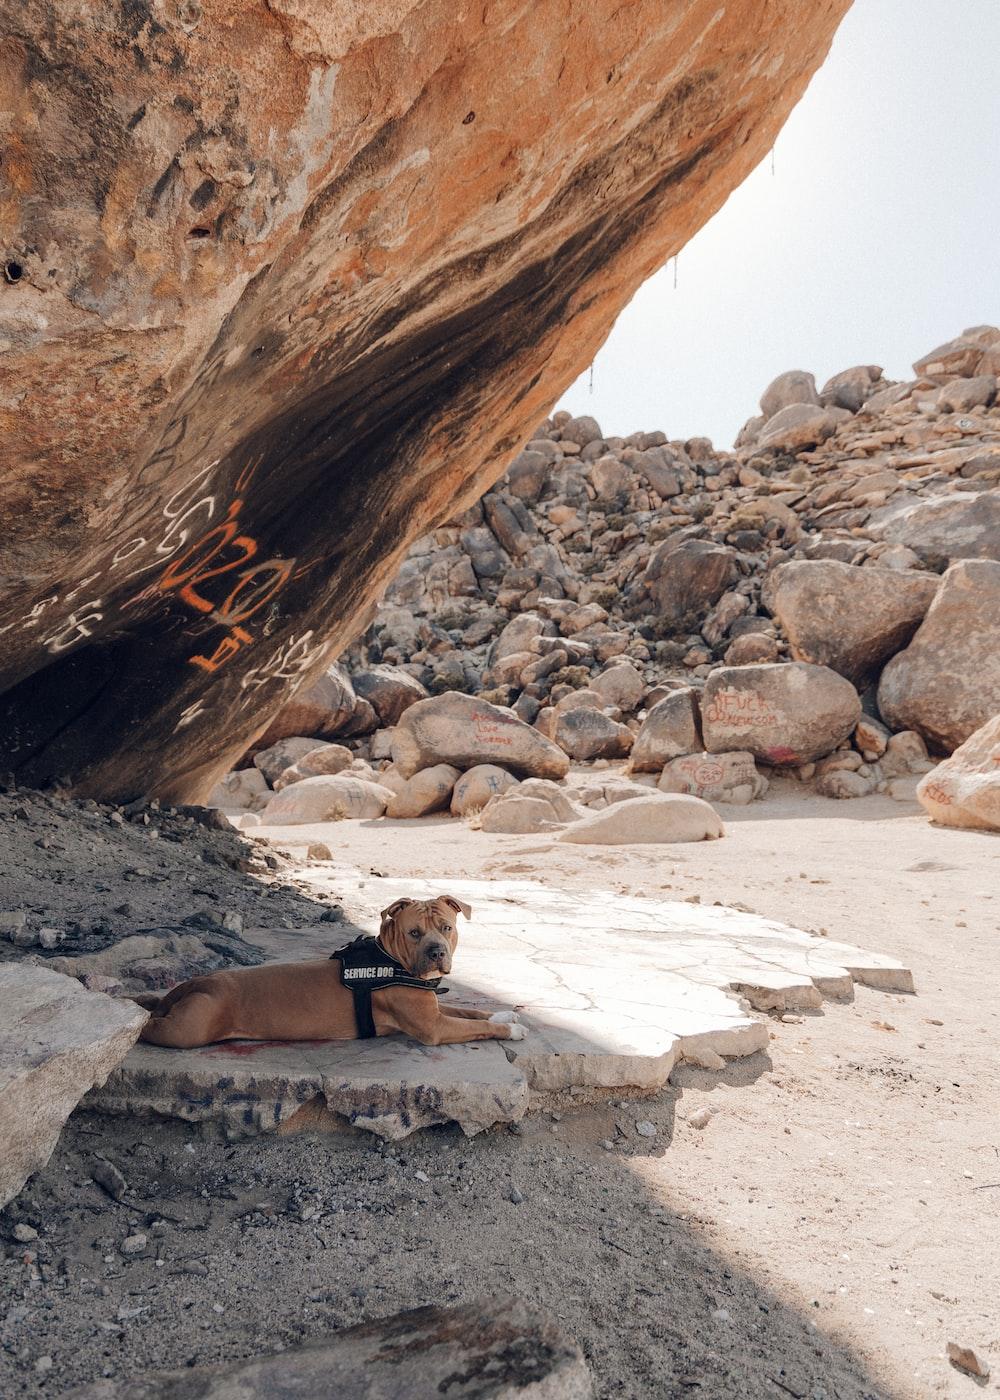 man in black shorts sitting on rock near brown rock formation during daytime